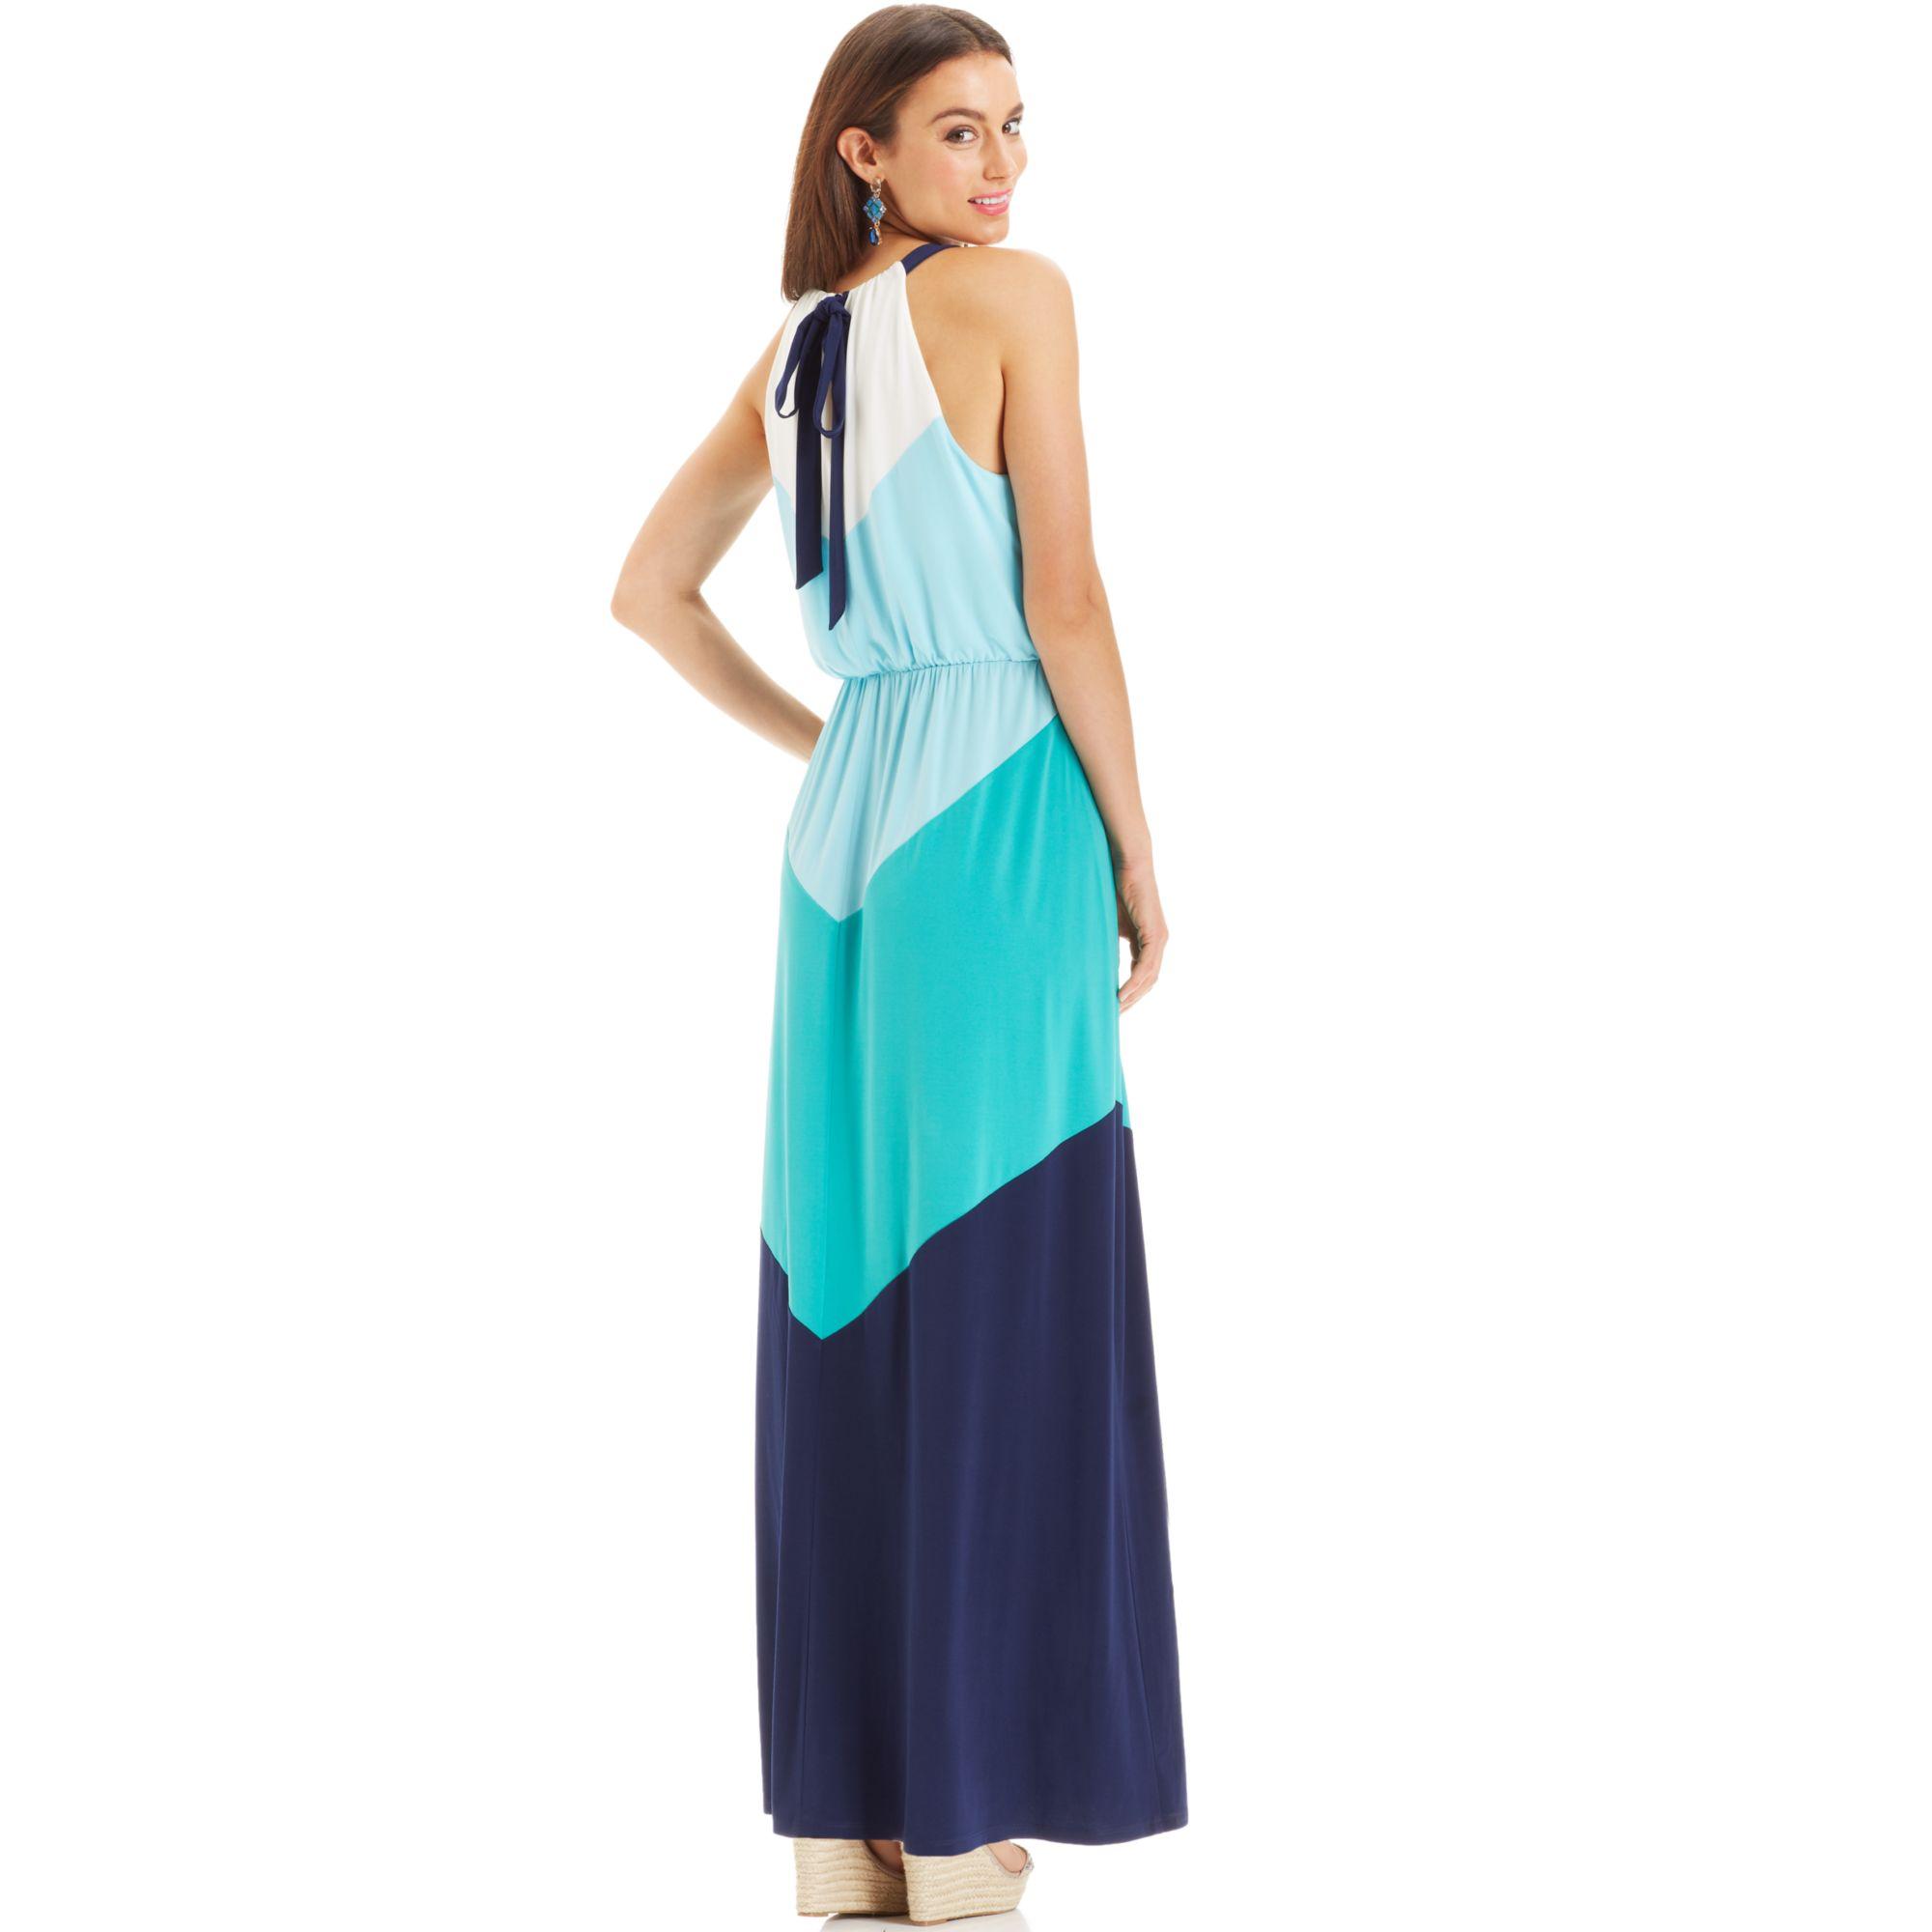 Lyst - Vince Camuto Colorblock Chevron Halter Maxi Dress